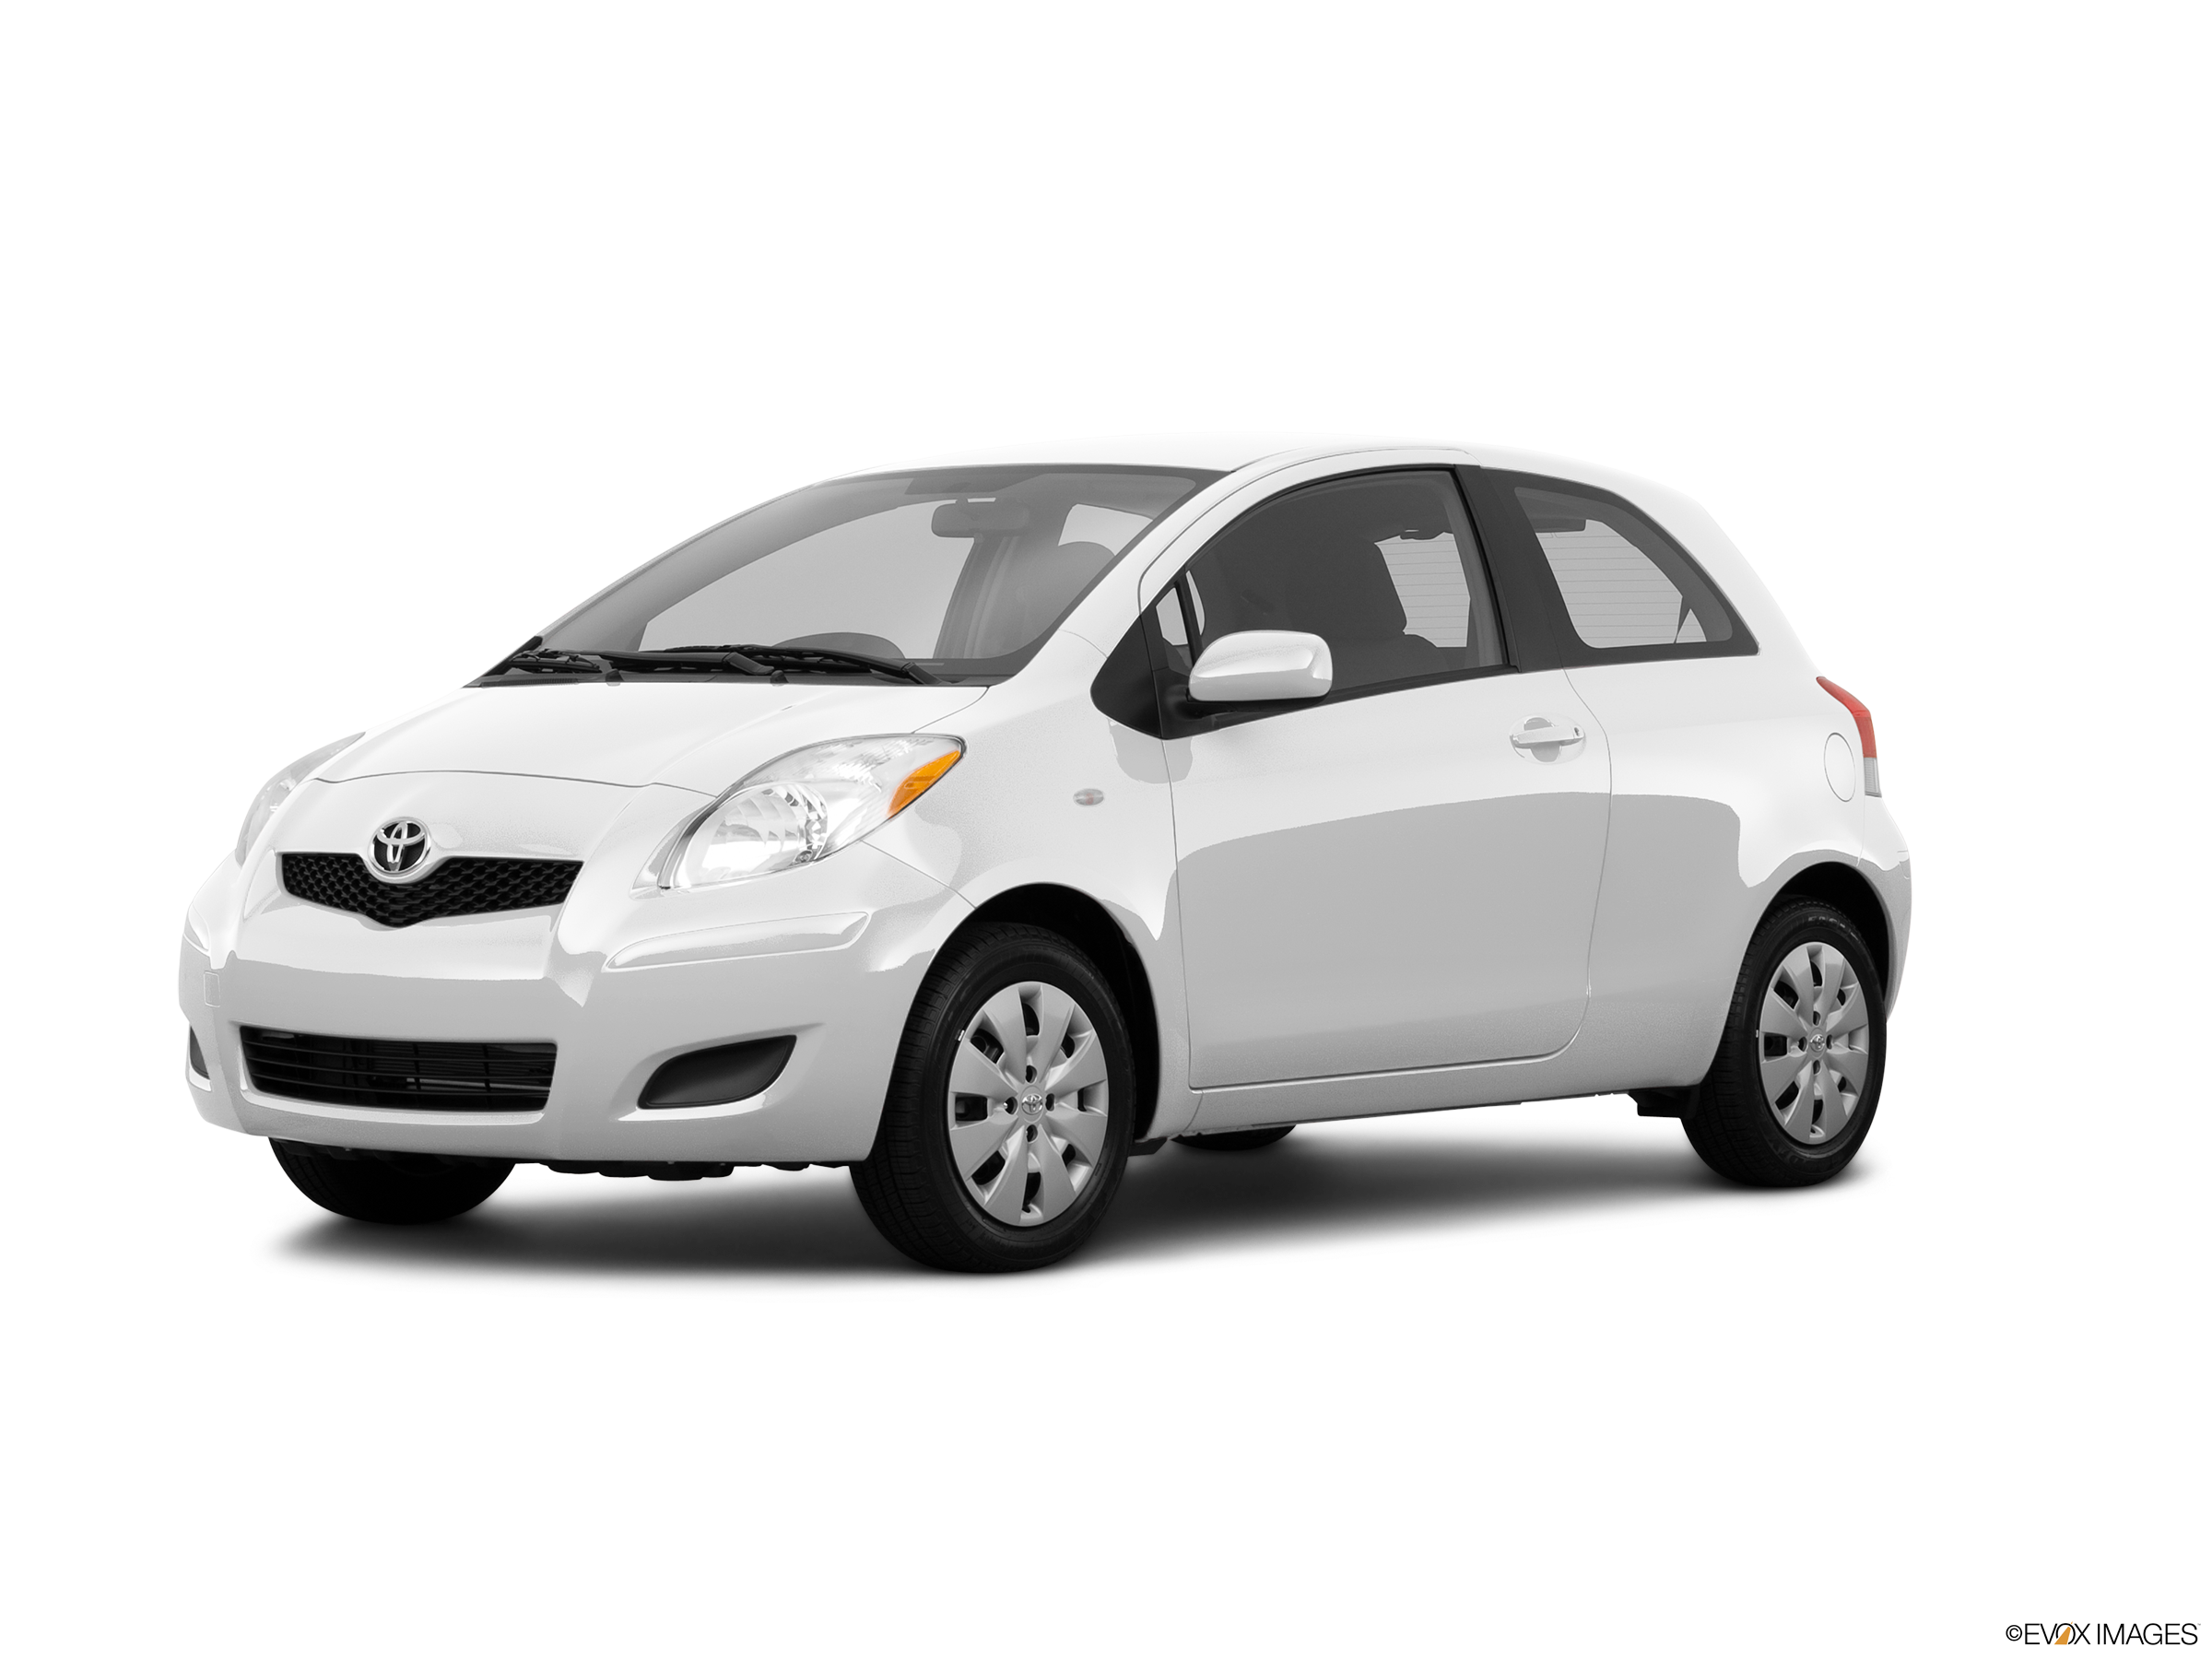 Kekurangan Toyota Yaris 2011 Spesifikasi